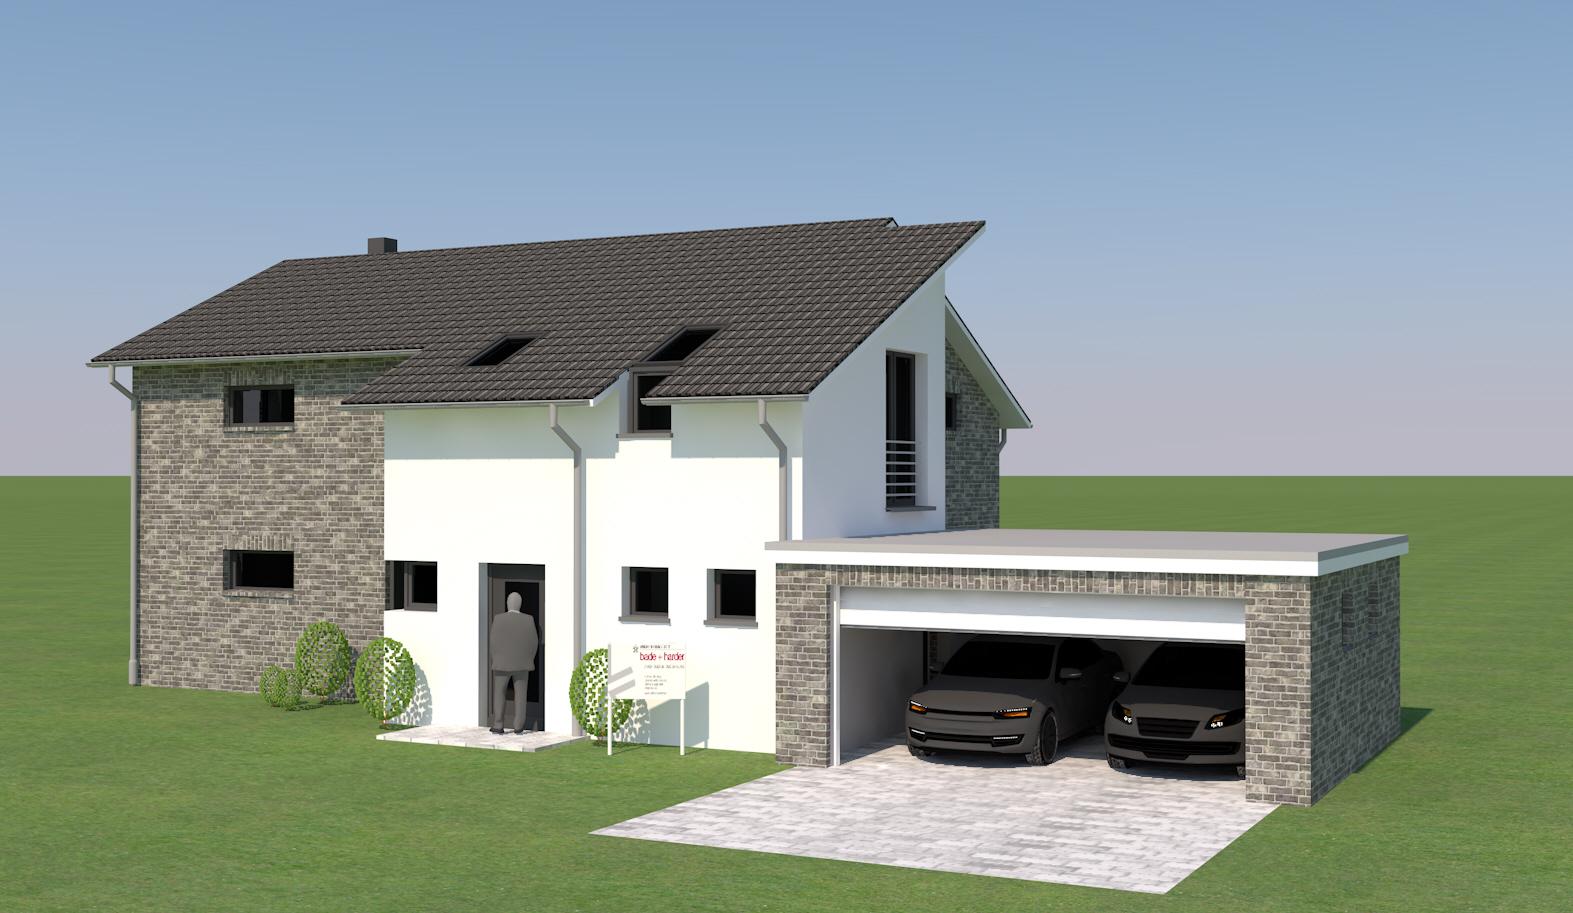 Neubau eines EFH in Meddewade